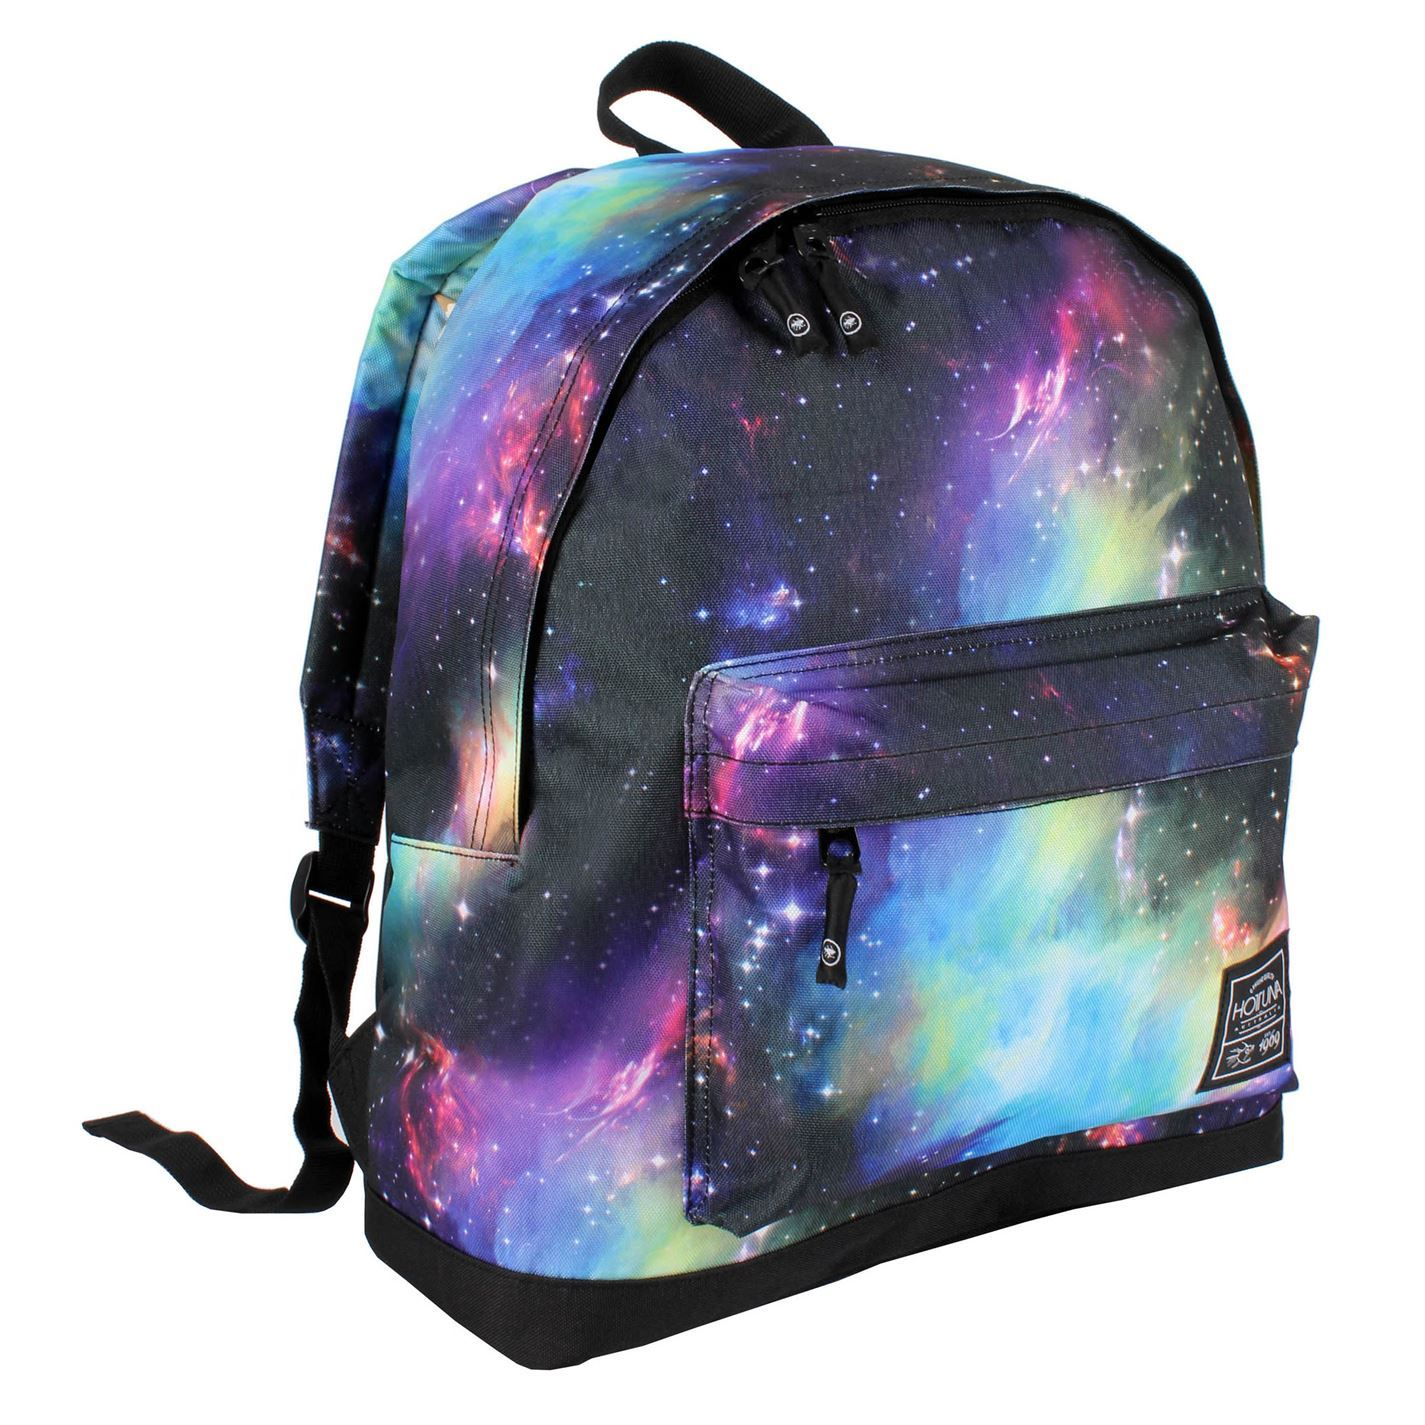 Hot Tuna Galaxy Back Packs Rucksack Bag Travel Luggage